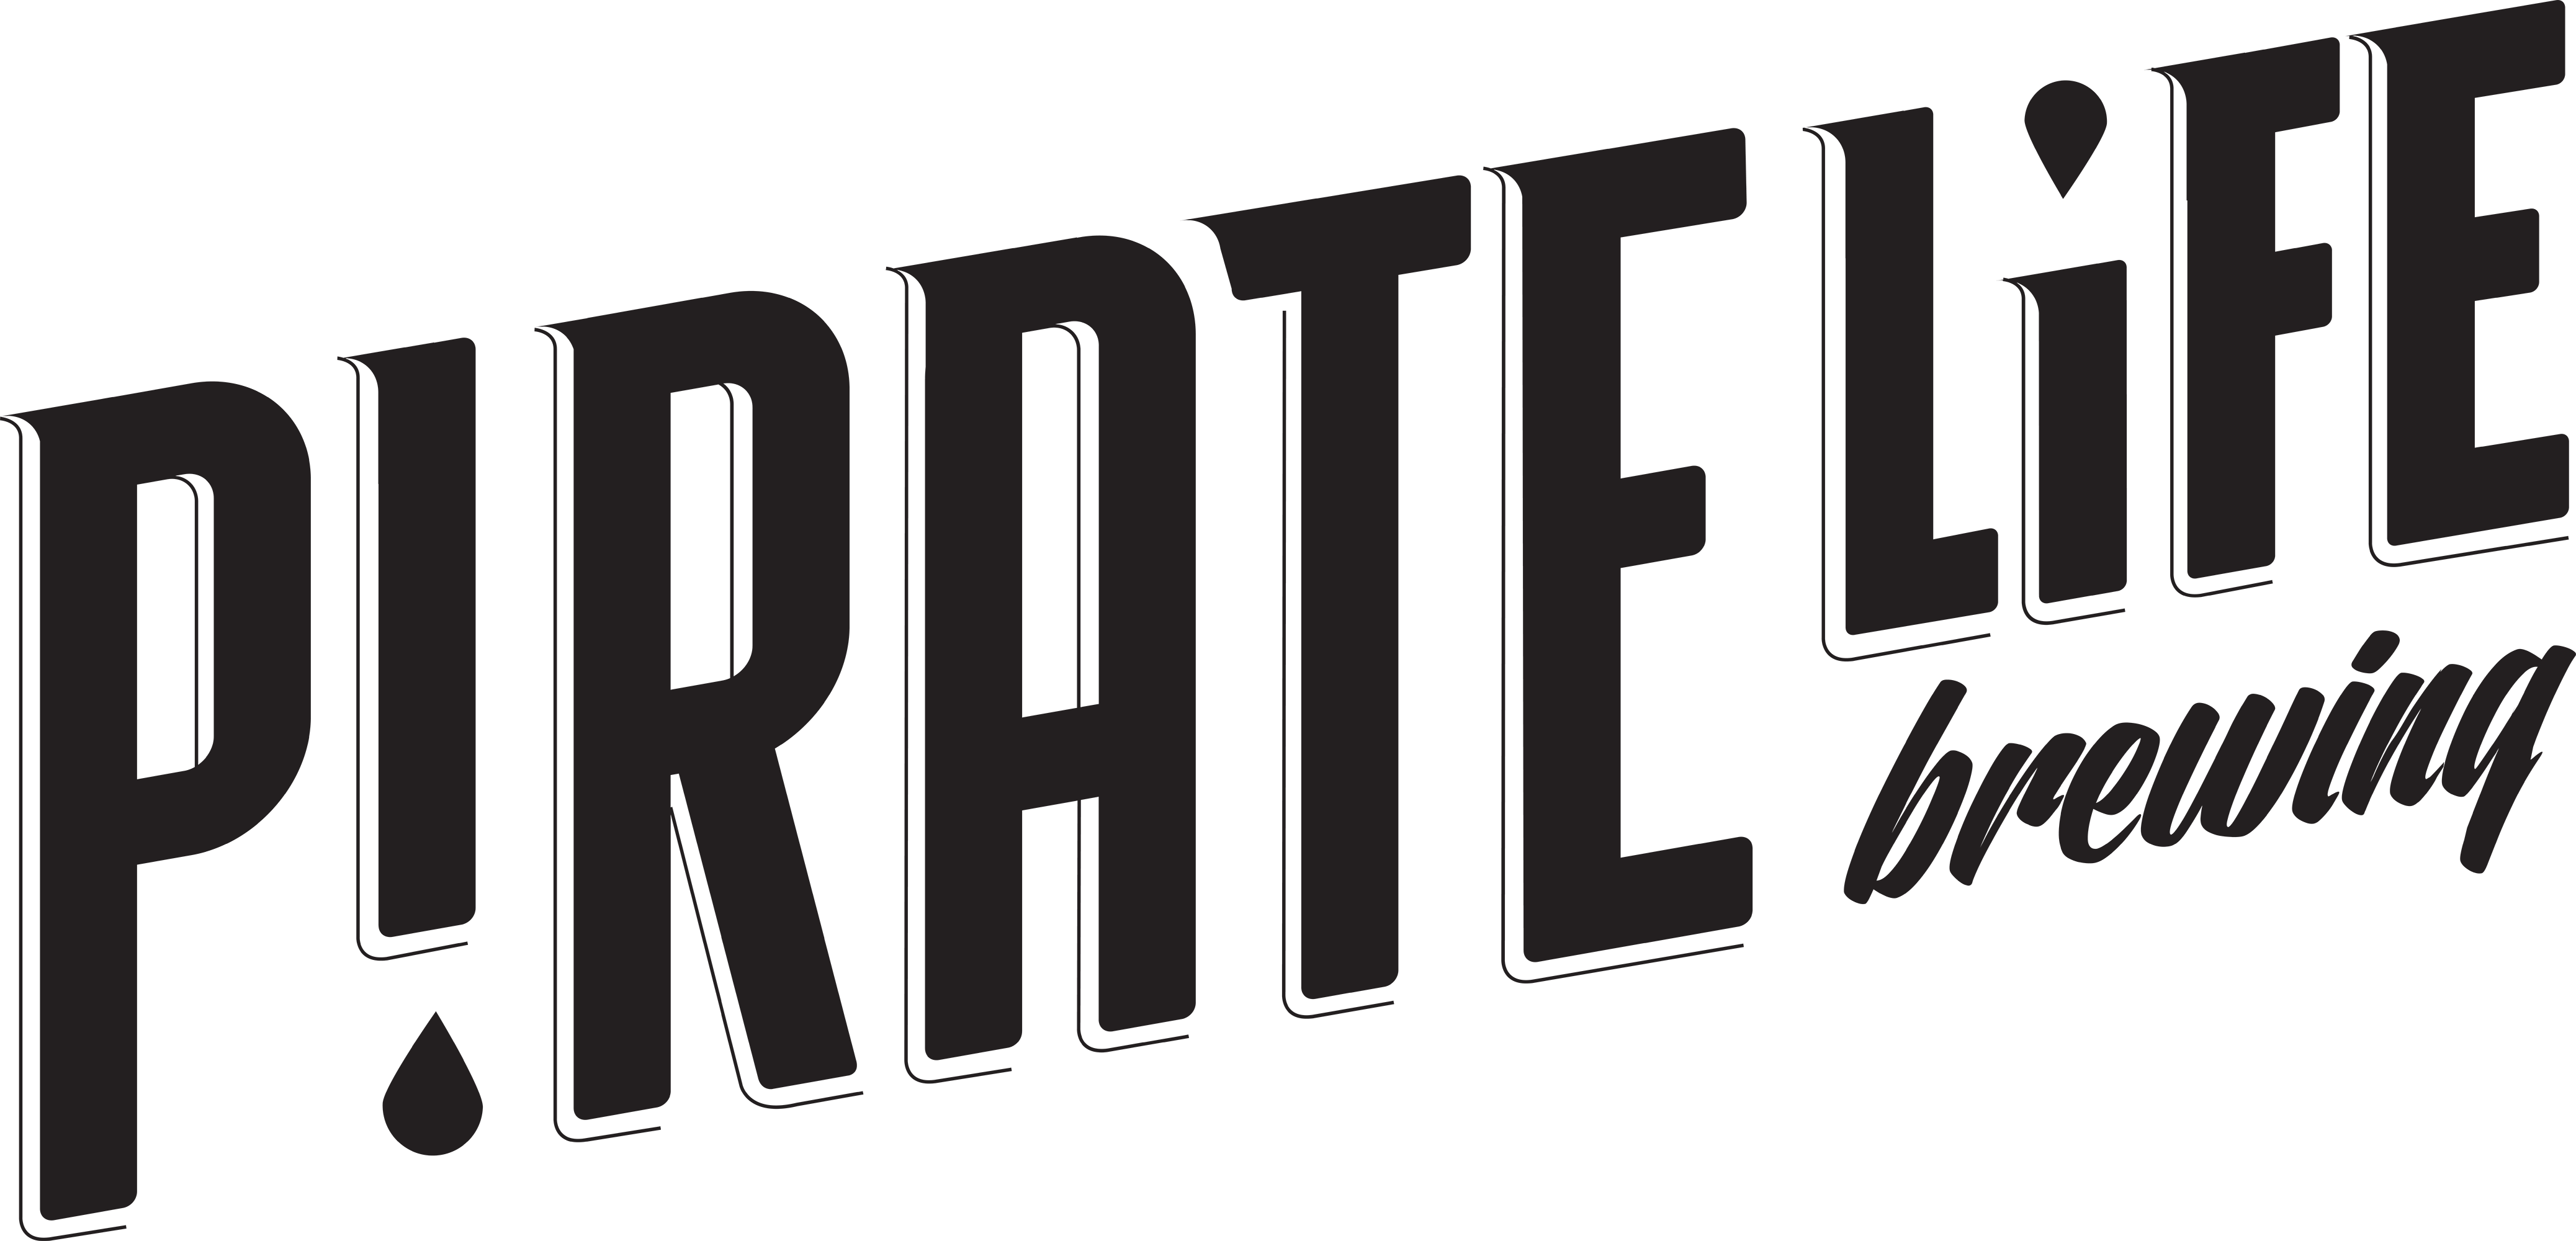 Pirate life logo simple